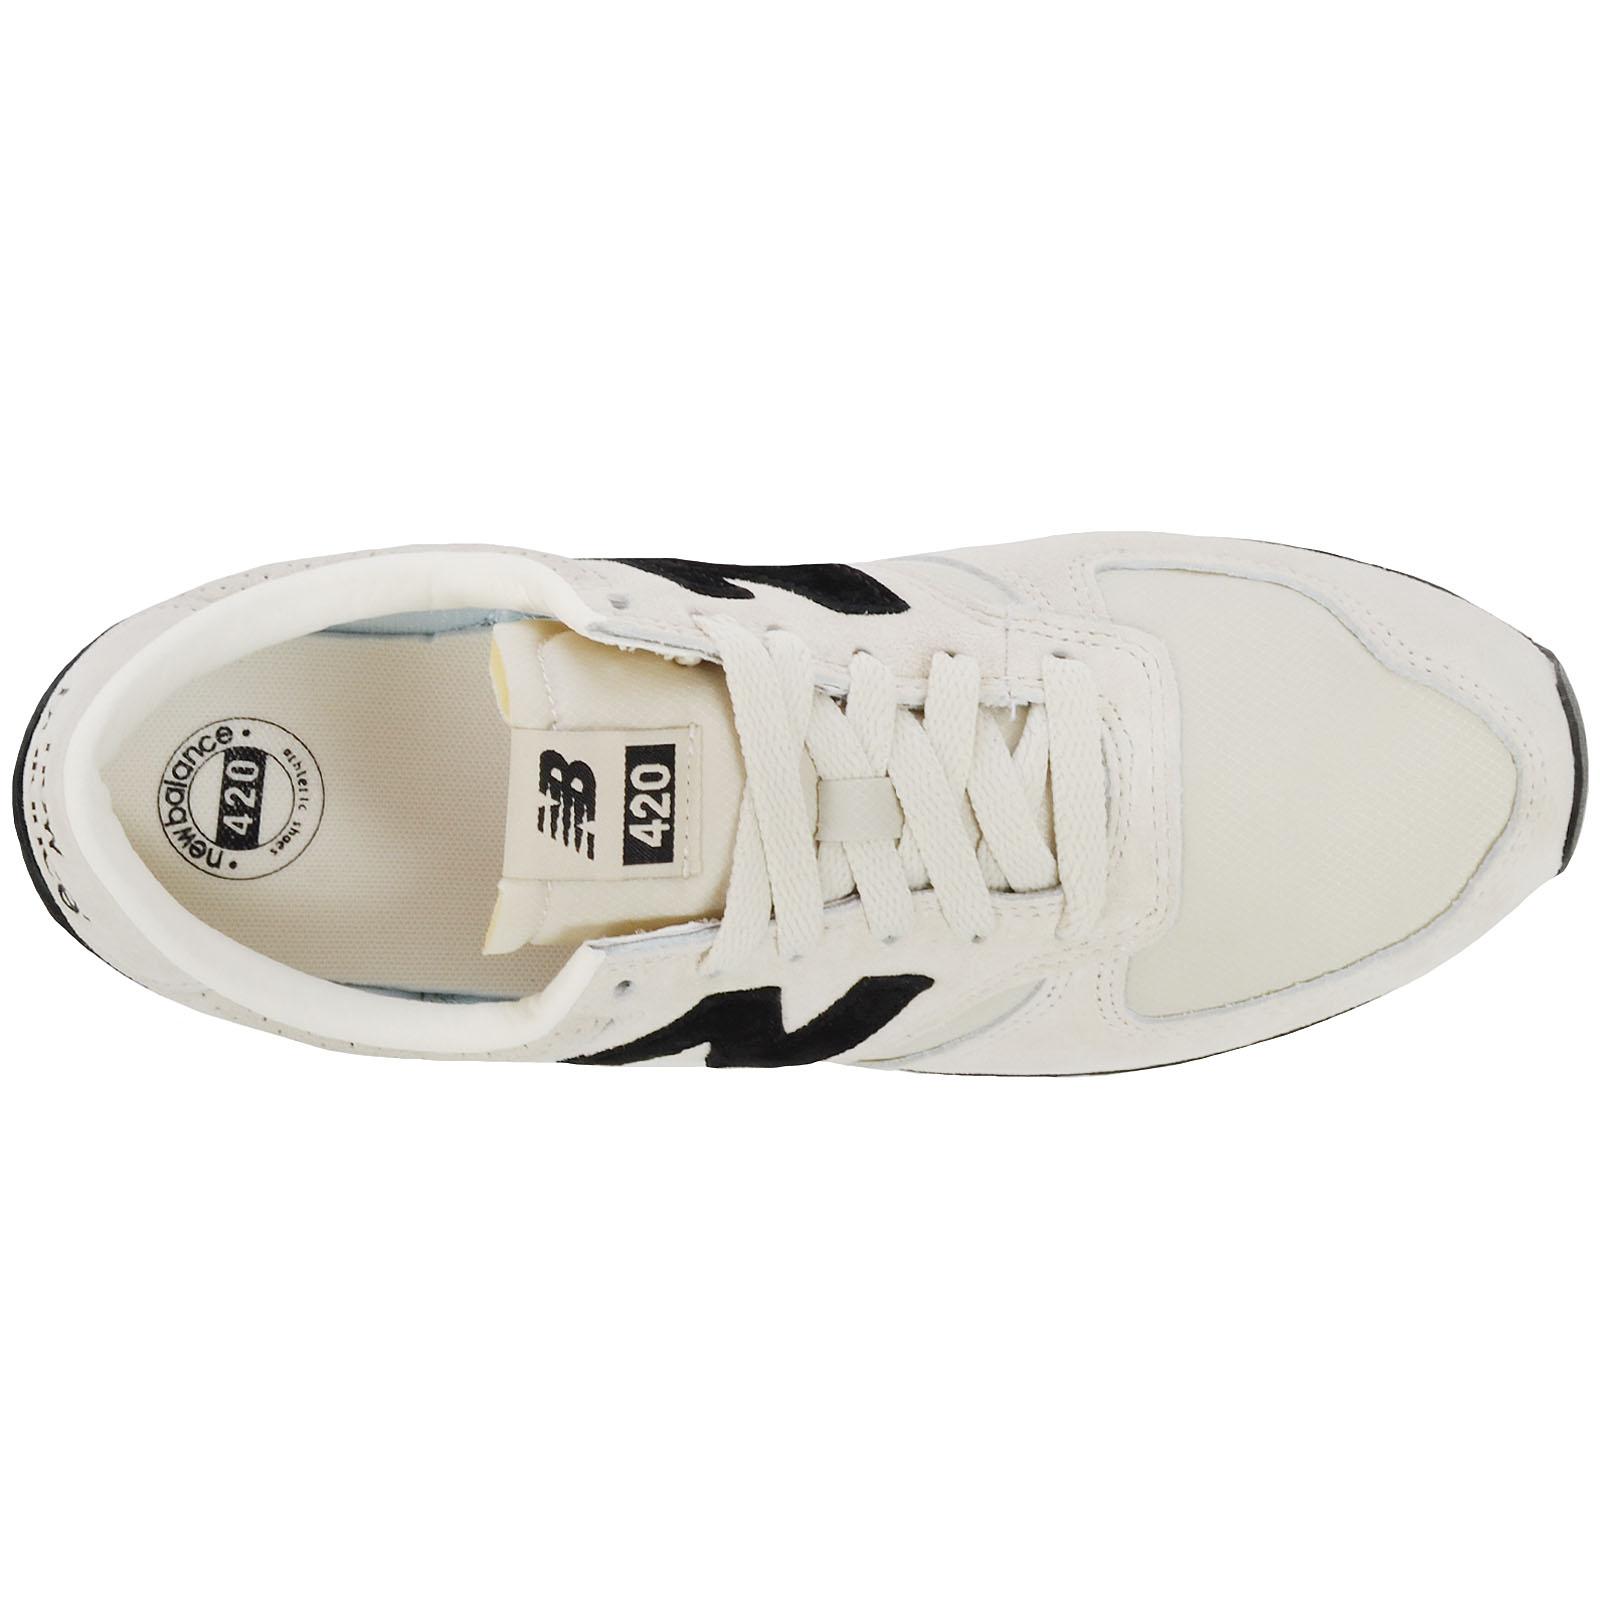 New Balance Reengineered NB 420 Mens Classics Casual Reengineered Balance Suede Shoes Trainers d0ba8b